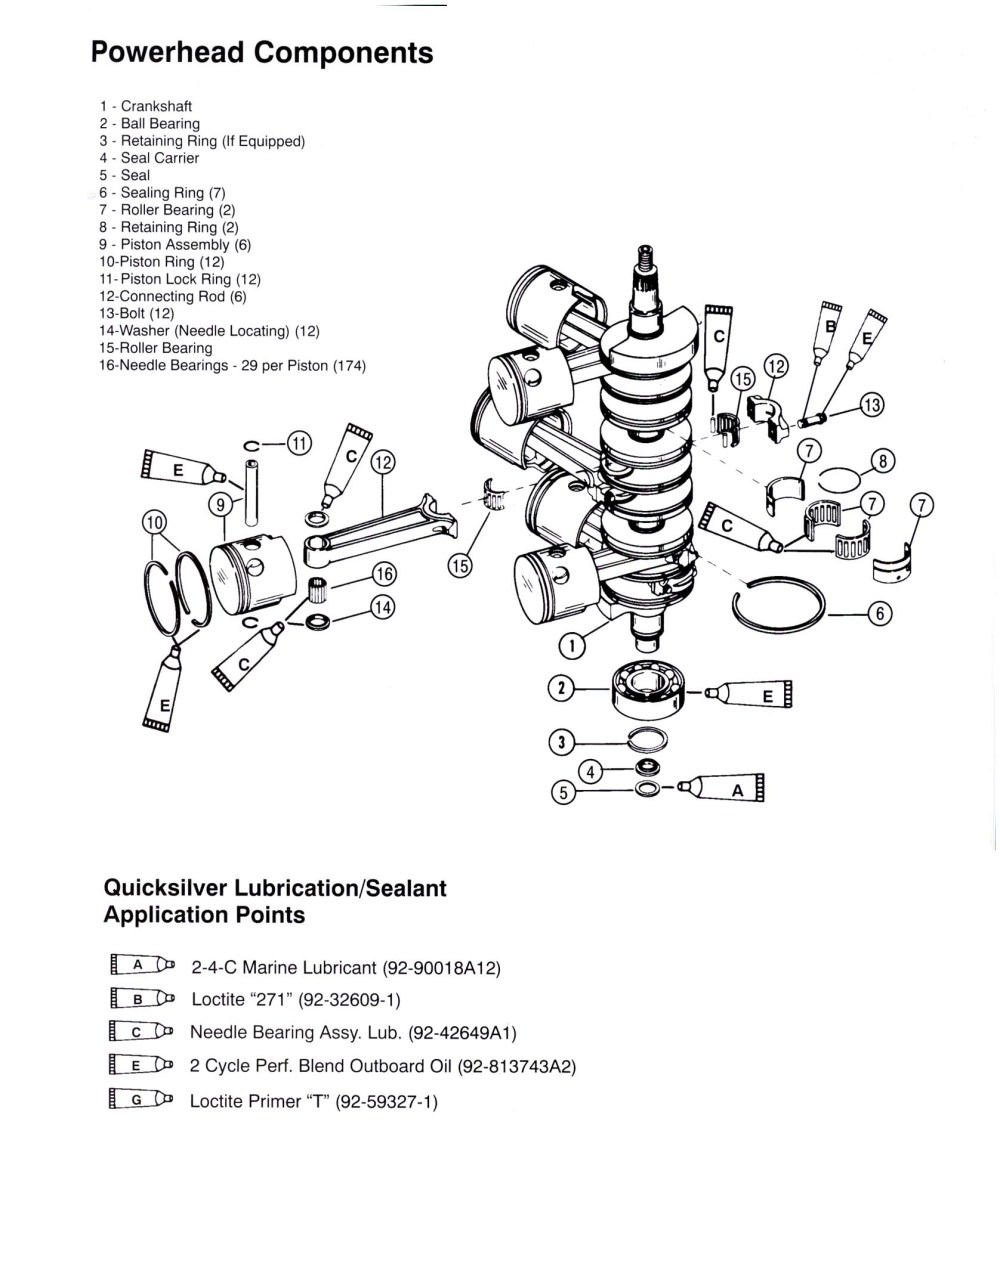 medium resolution of powerhead torque specs 2 4 fish pg1 2 4 fish pg2 8 2 5 fish pg1 2 5 hi po pg1 2 5 hi po pg2 2 5 hi po pg3 2 5 assembly lubes